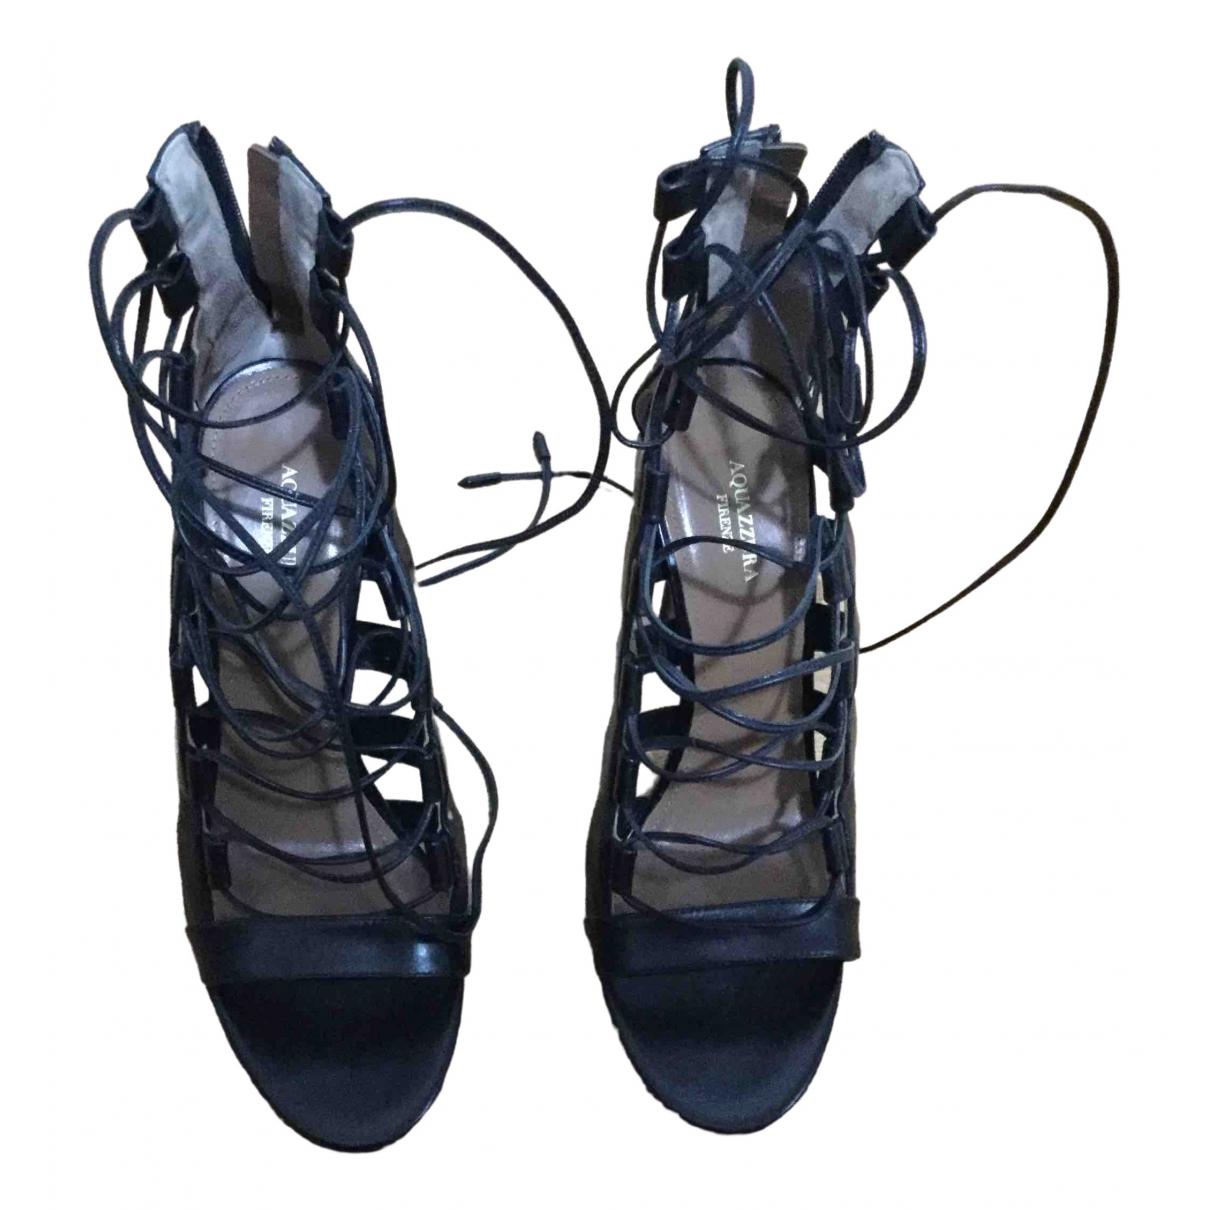 Aquazzura \N Black Leather Sandals for Women 37.5 EU